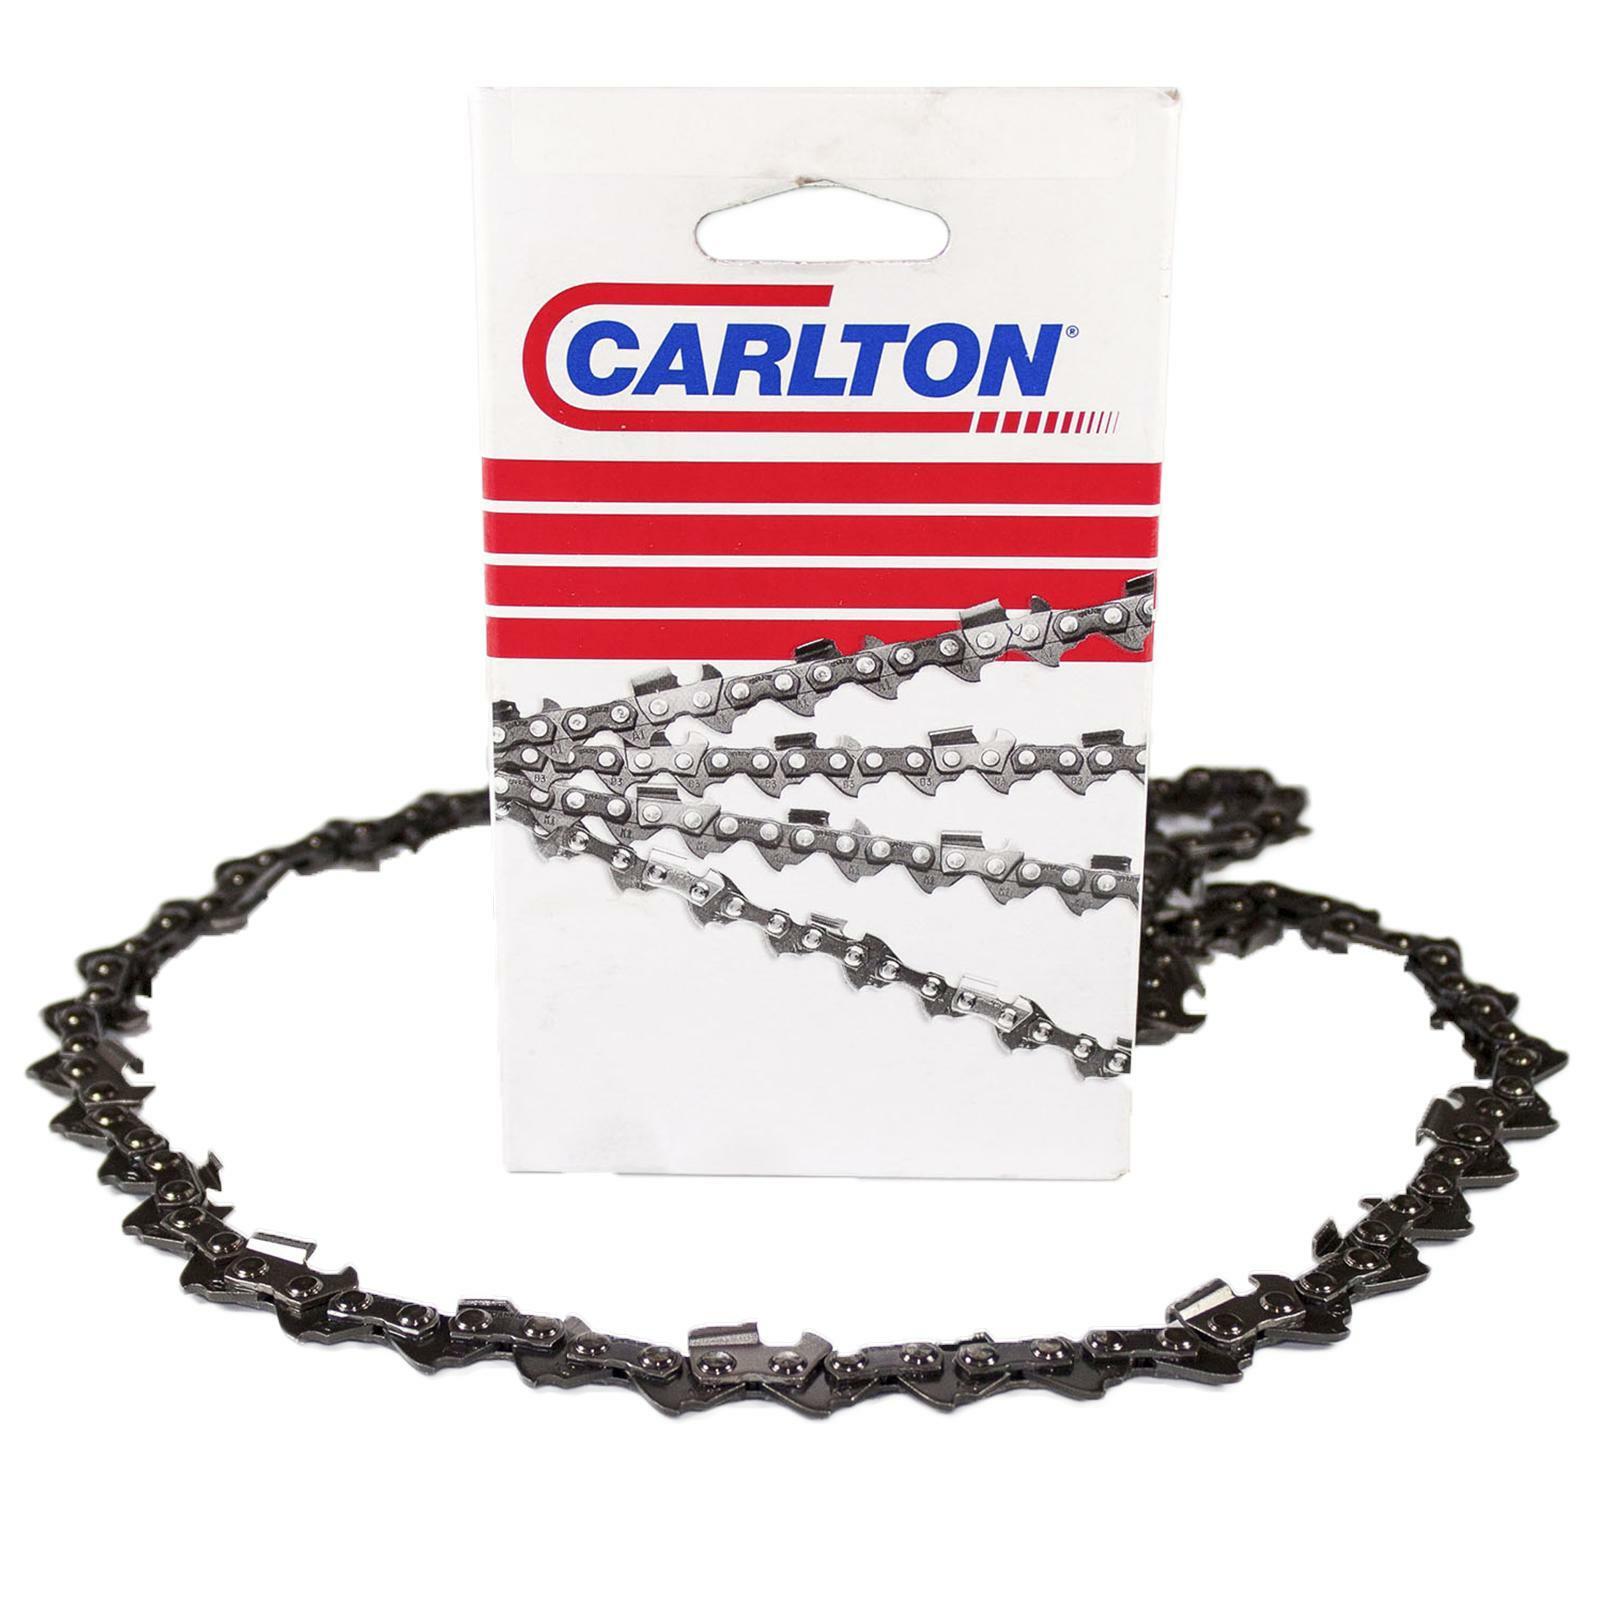 carlton catena per motosega carlton 3/8 sp 1.5 cm 50 68 maglie